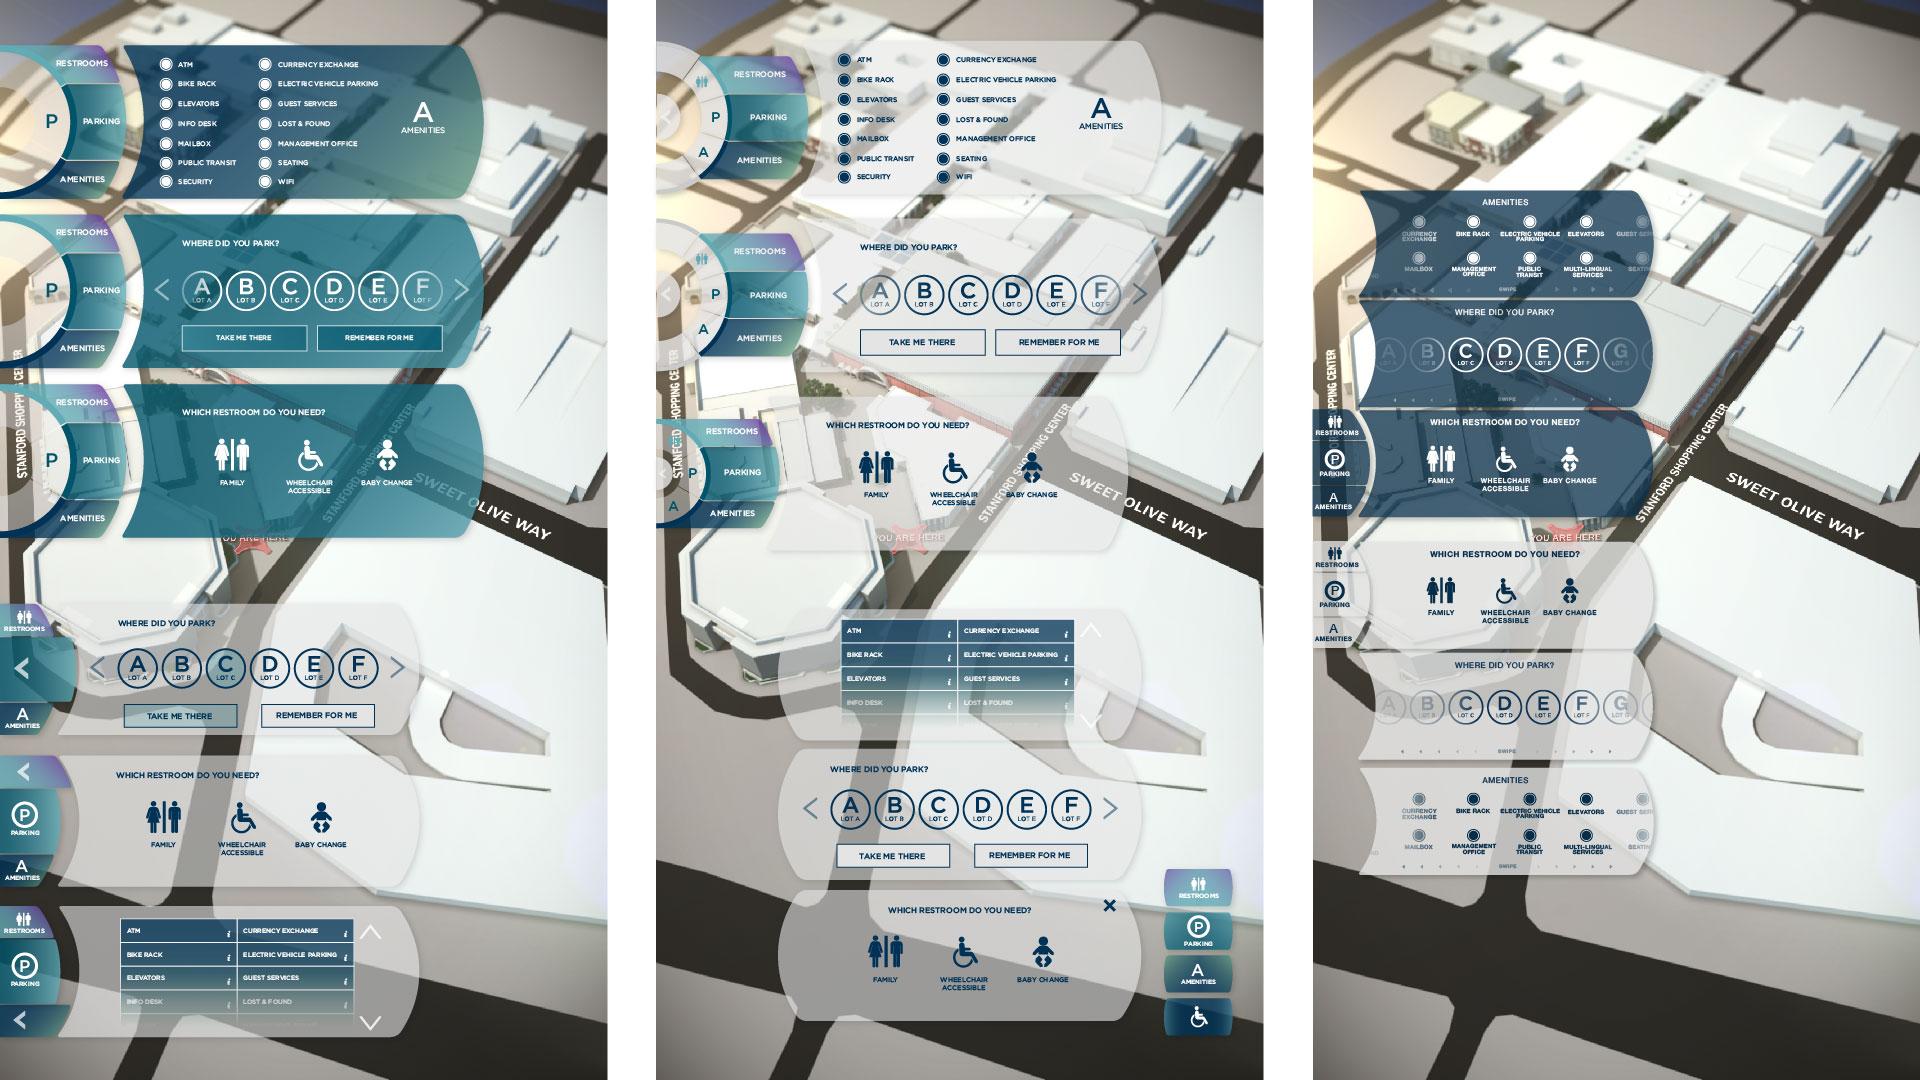 design_016_sidepanel.jpg